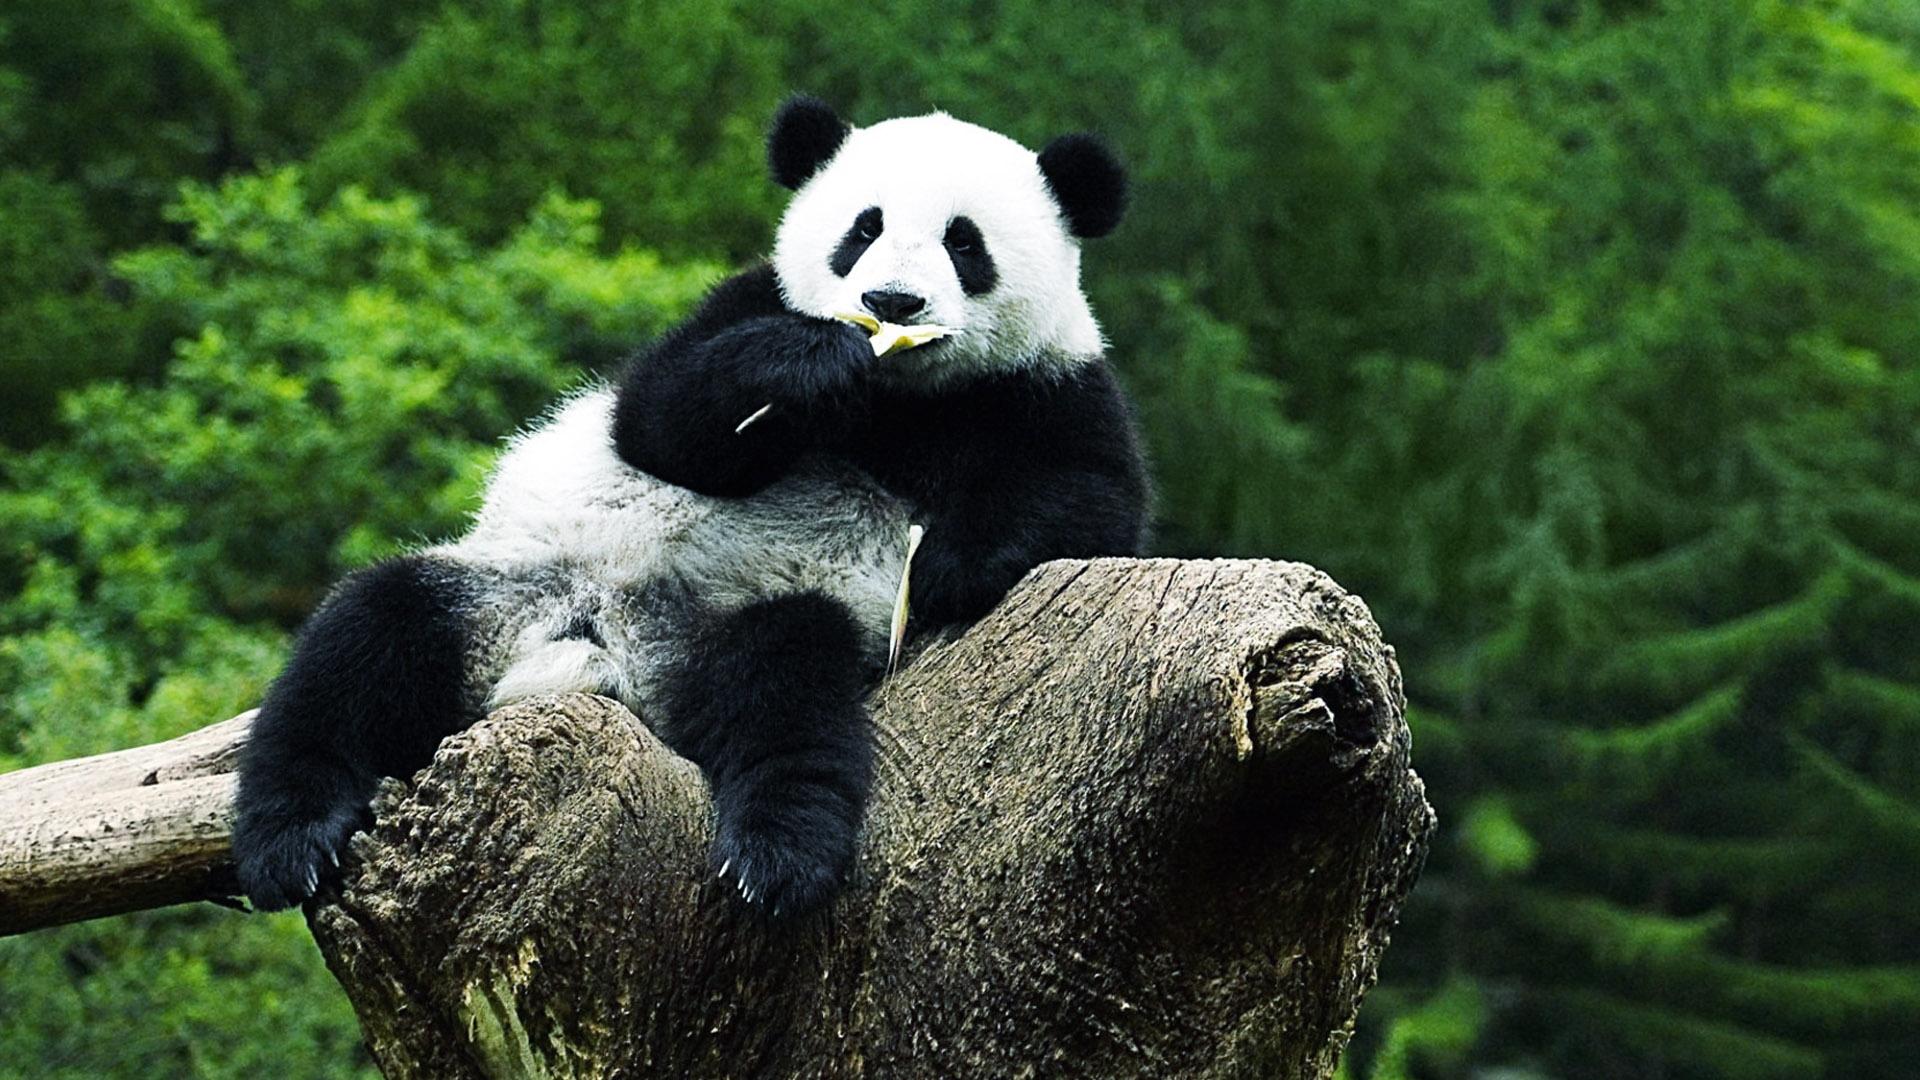 panda bear diet